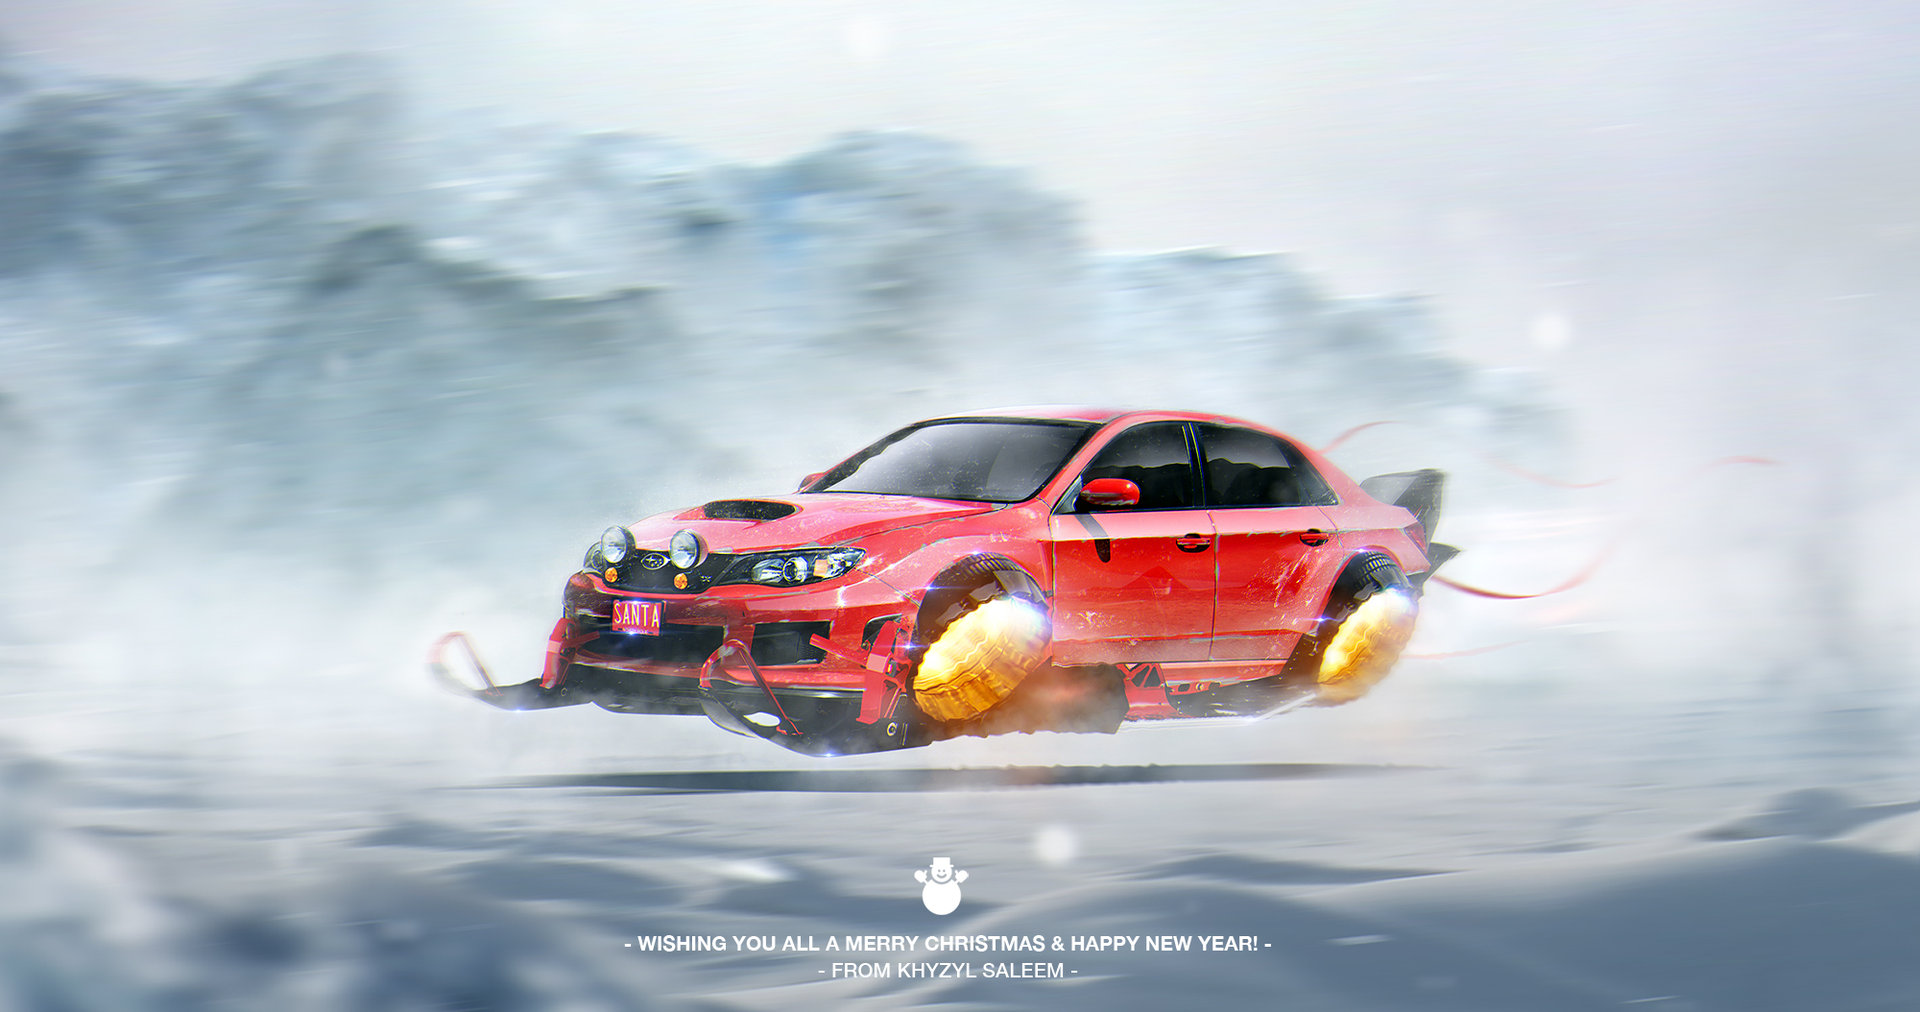 Audi Sports Car Wallpaper Cyberpunk Subaru Impreza Wrx Sti With Jets Is What Santa